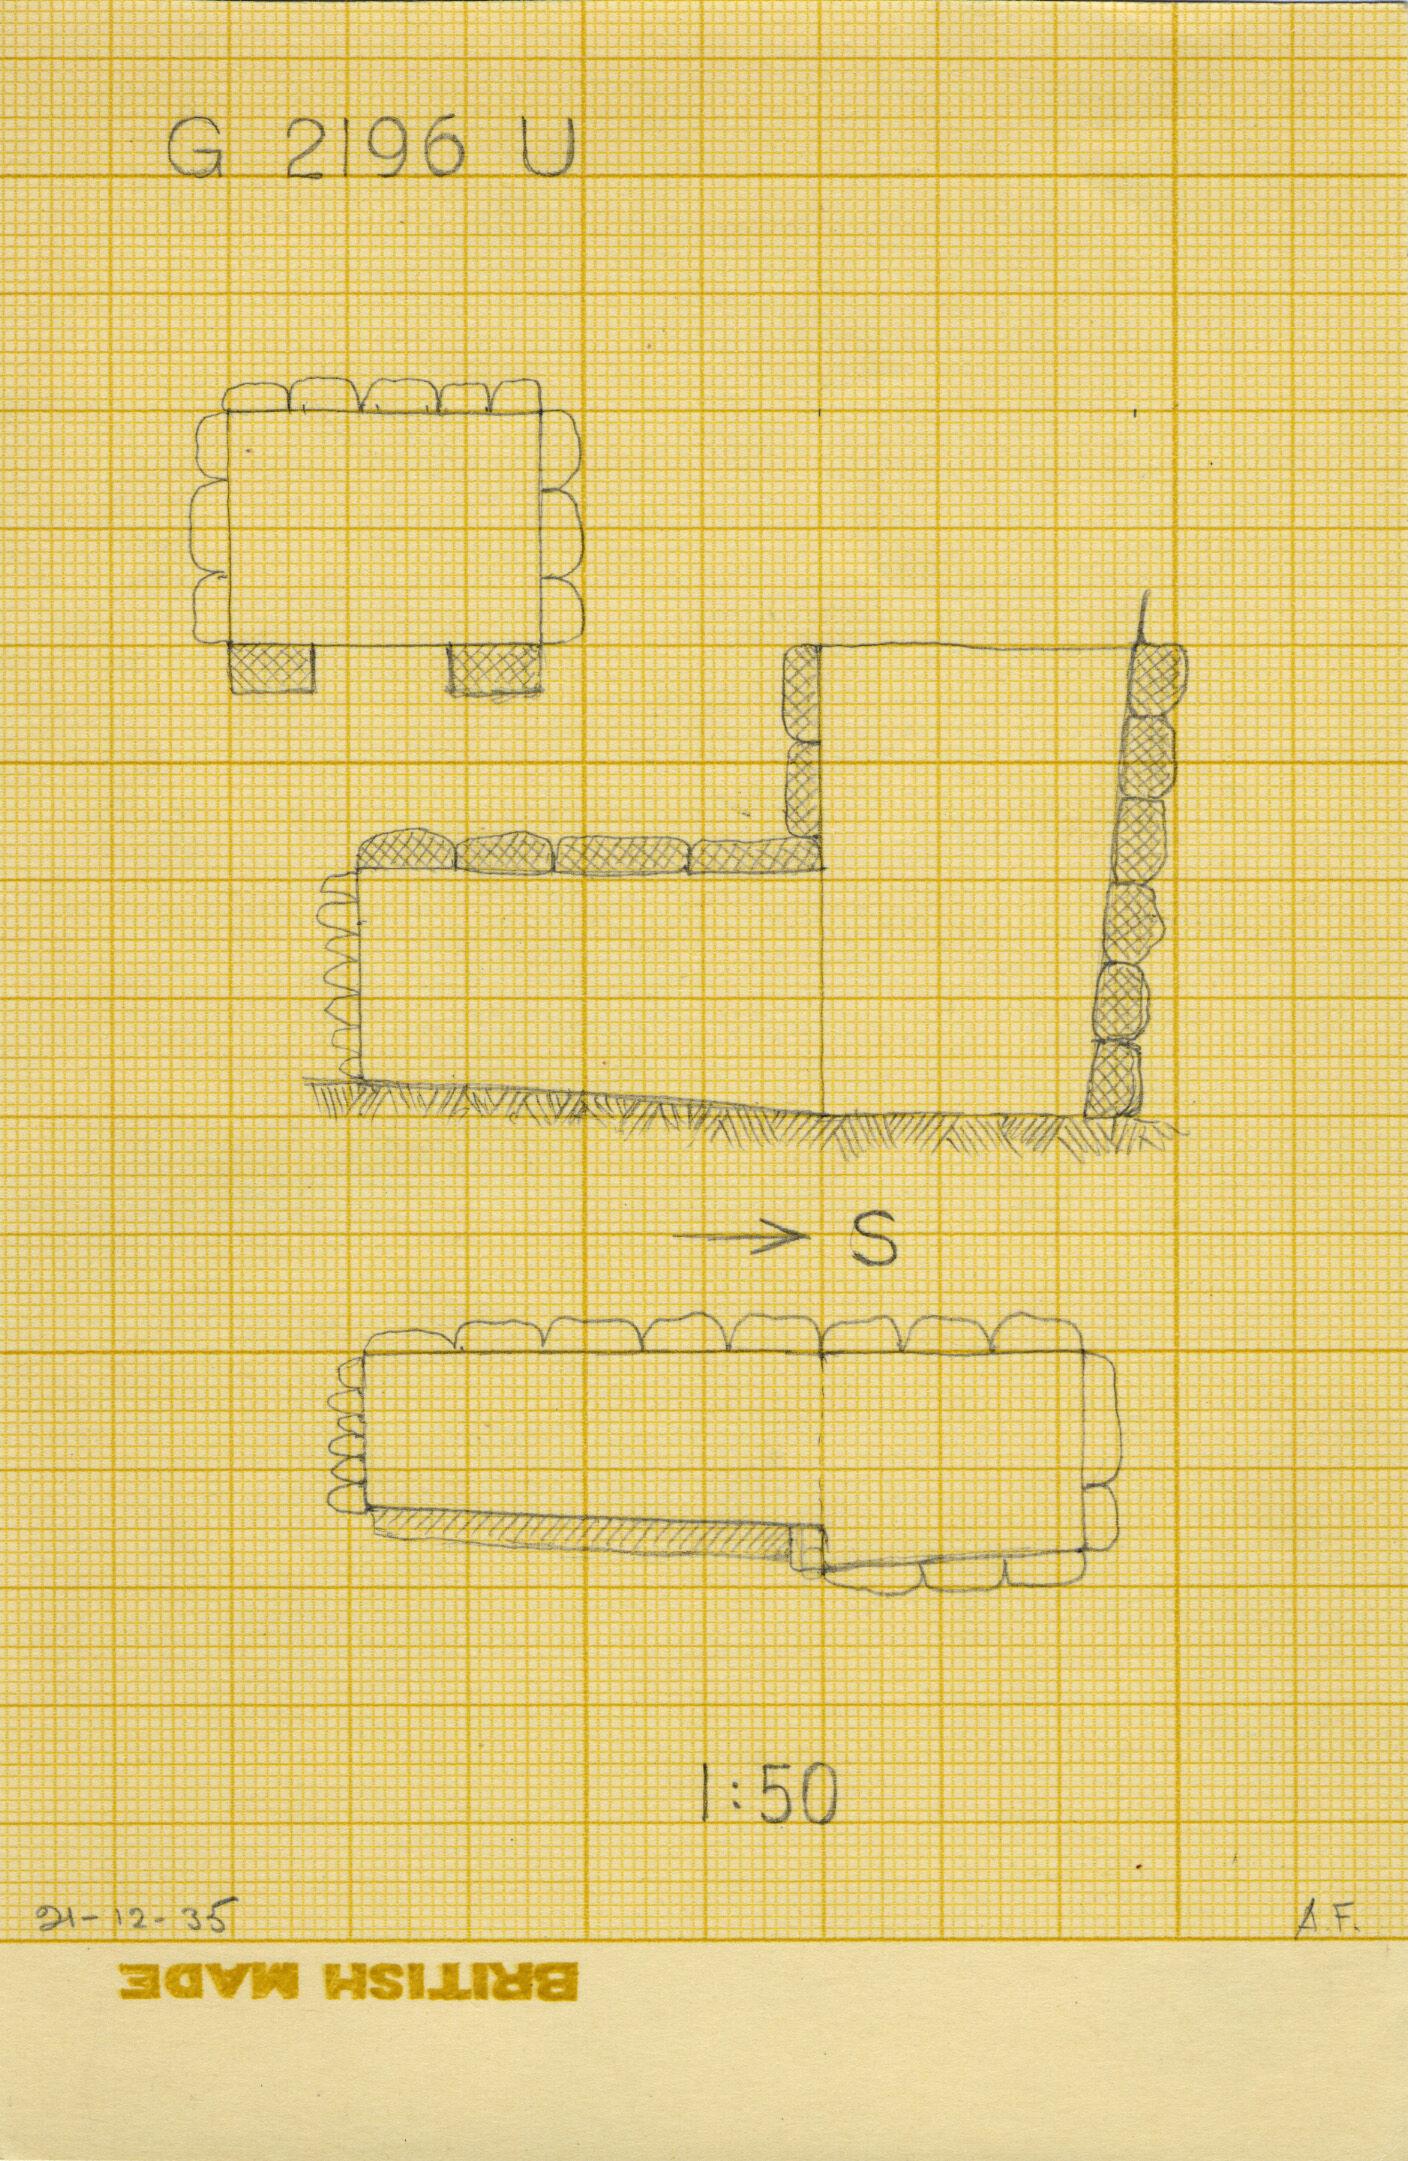 Maps and plans: G 2196, Shaft U